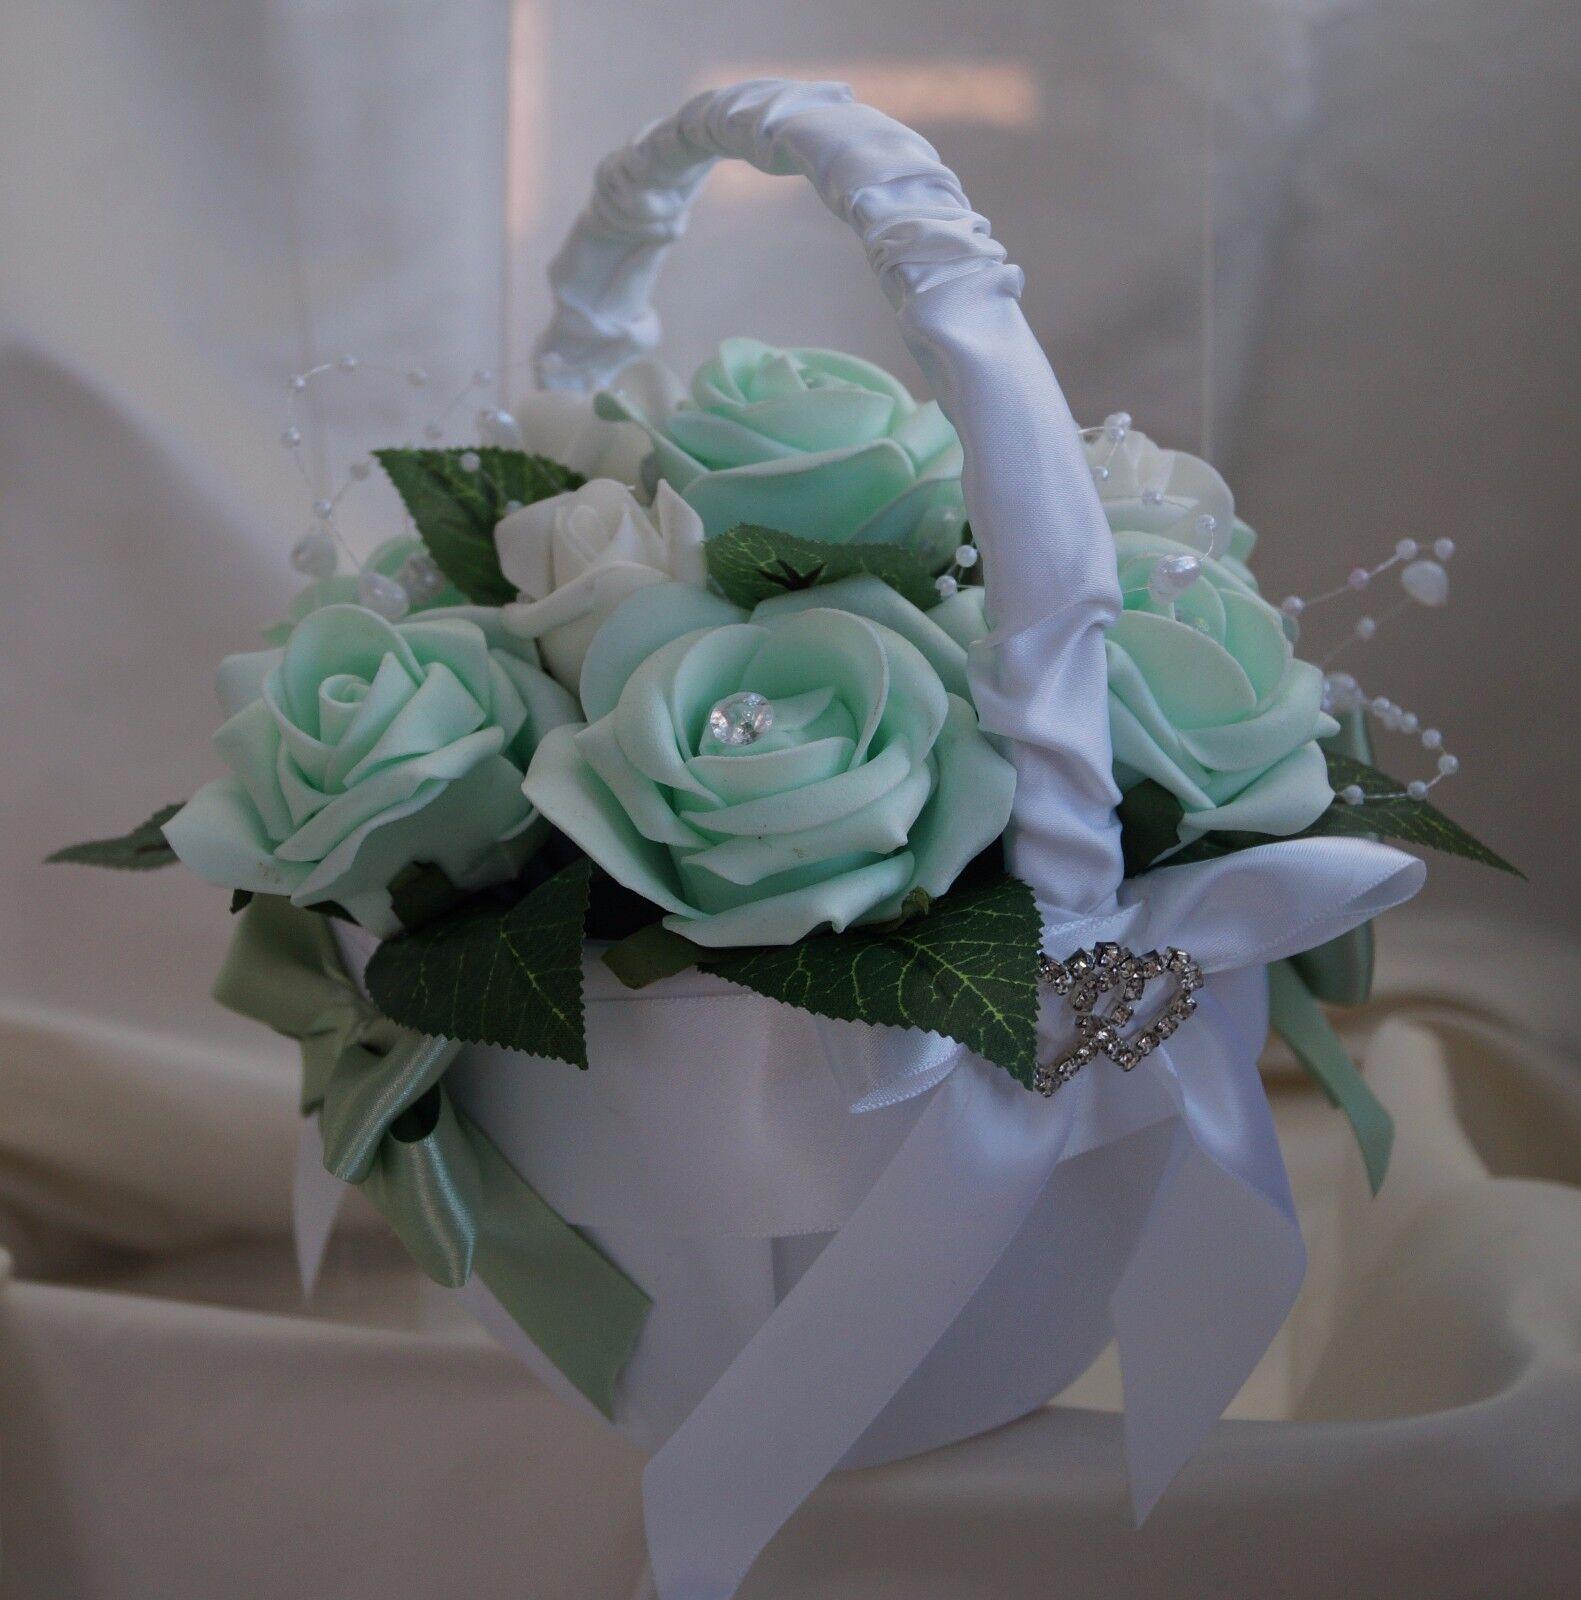 Nozze Fiori, Spose, Damigelle Bouquet Bianco Farfalla, Menta verde & Bianco Bouquet Avorio be7d7c